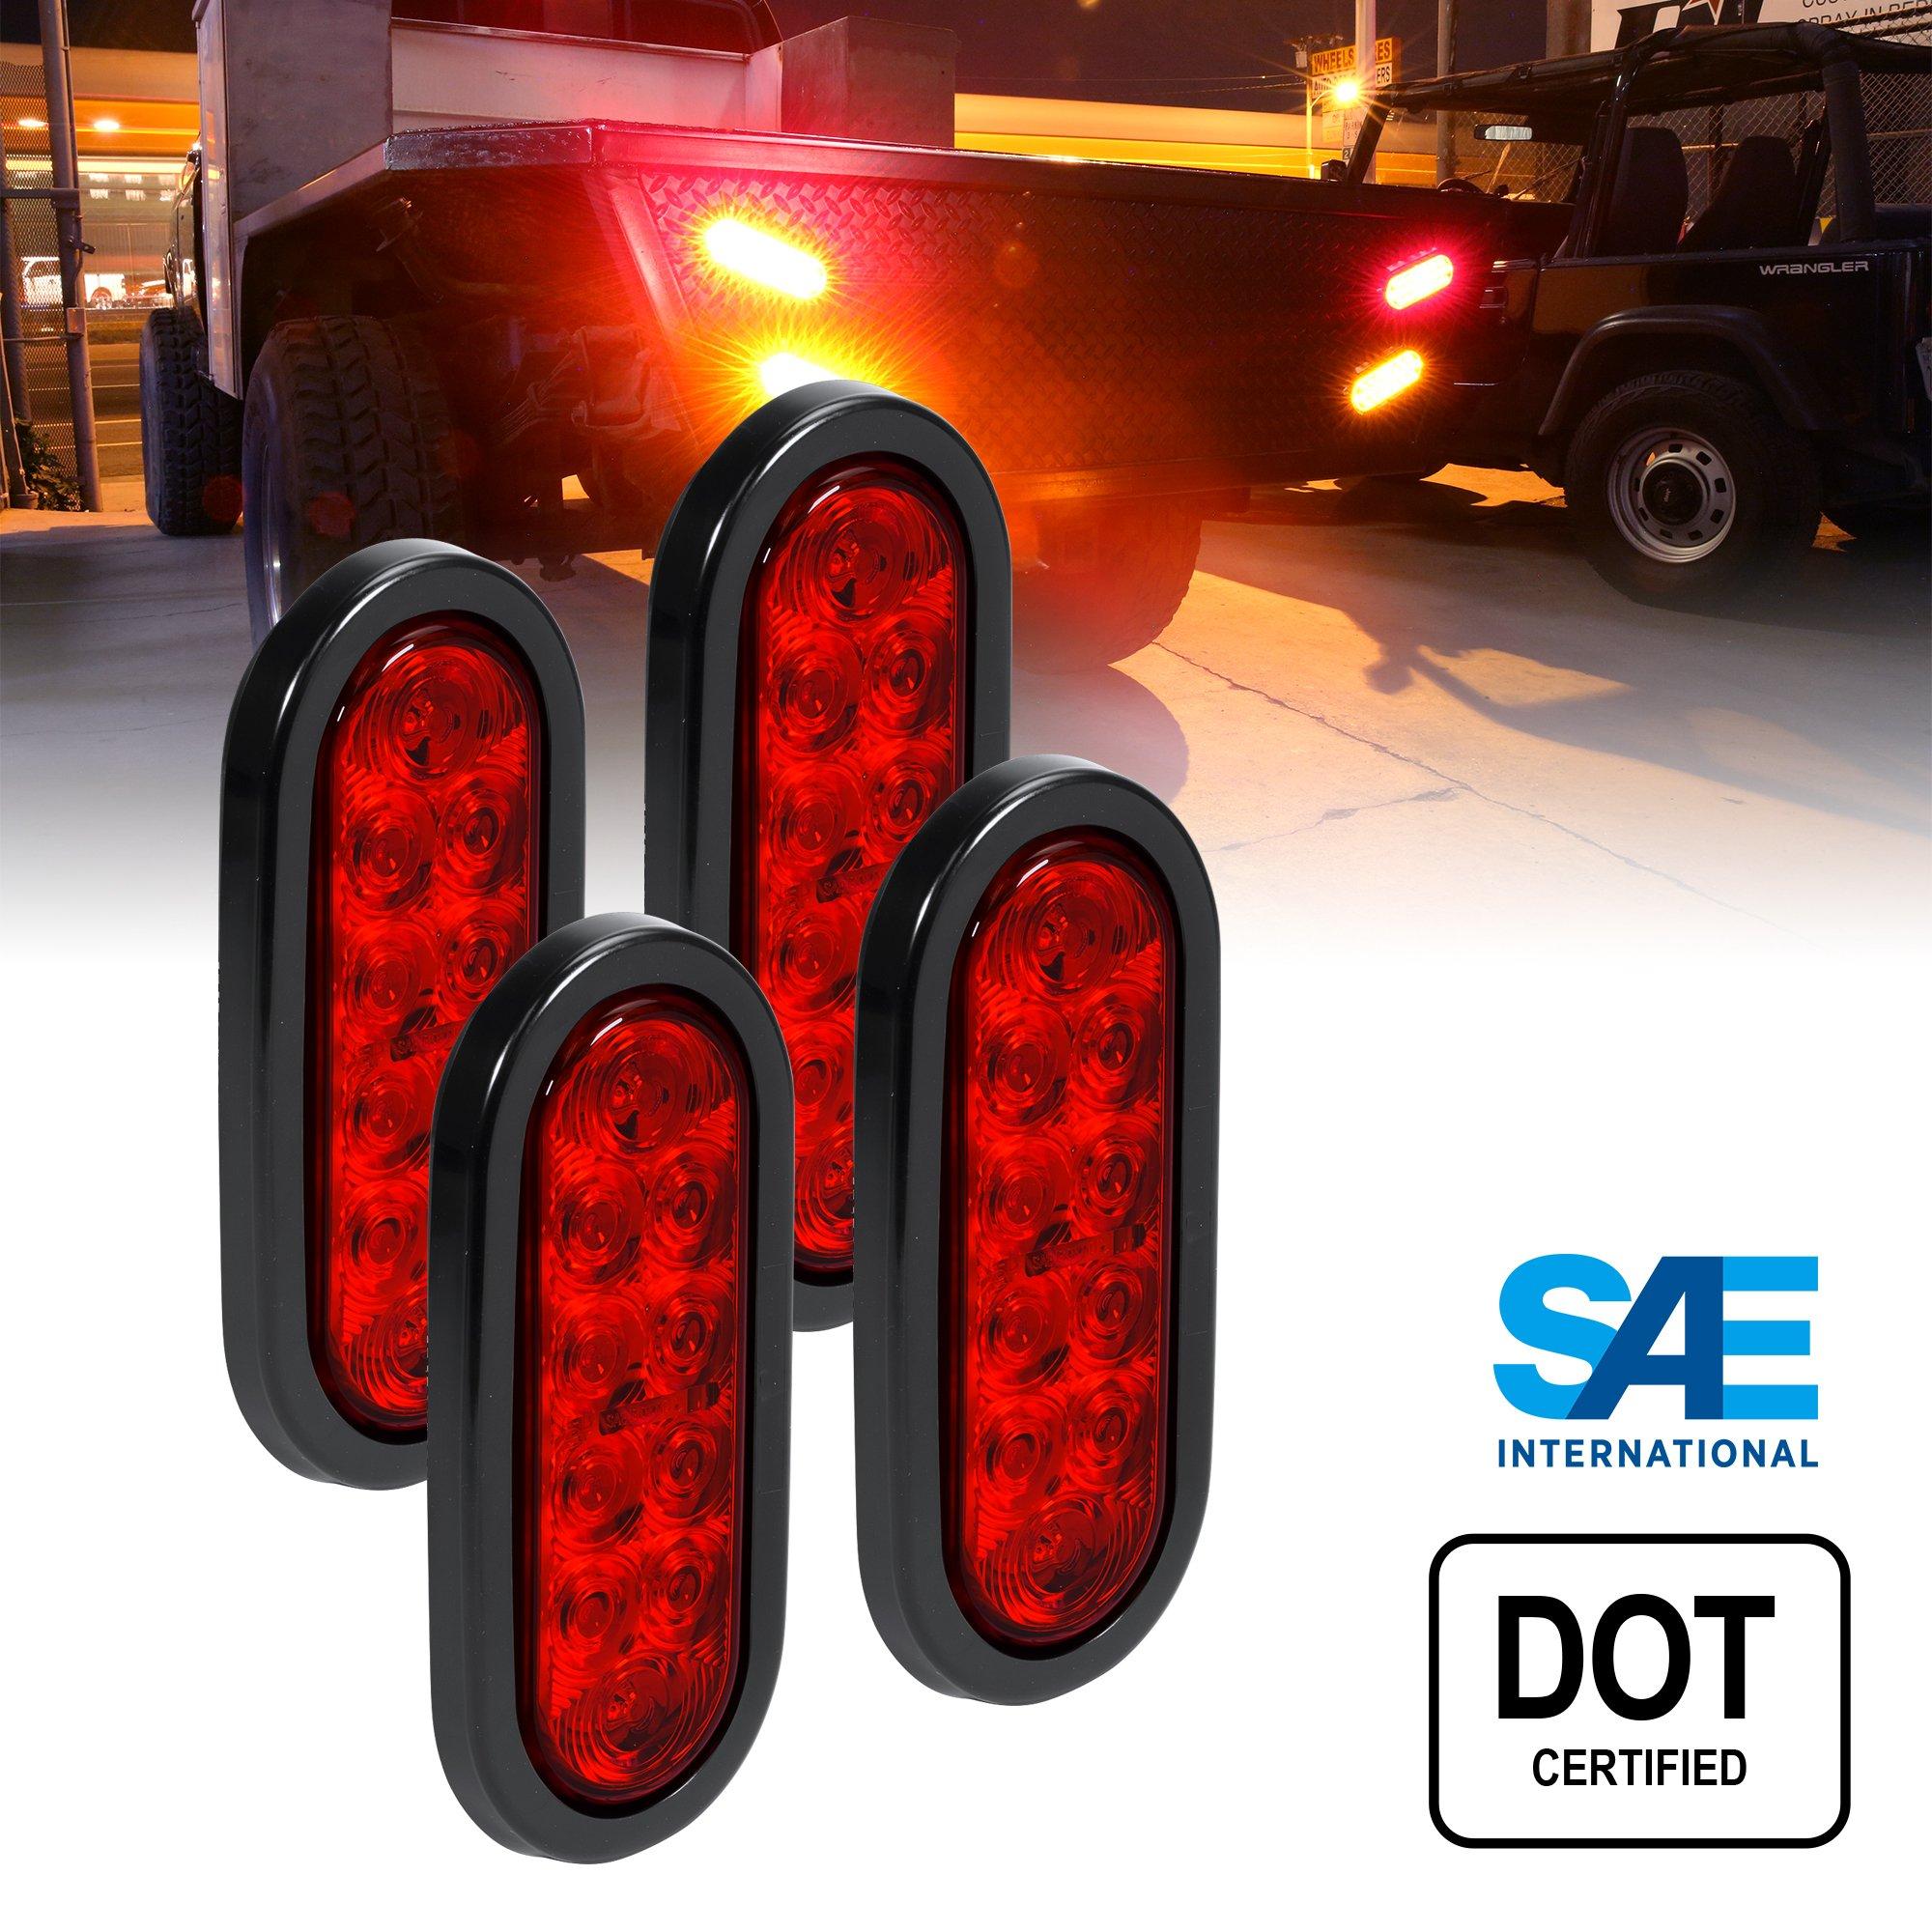 4pc 6 Inch Oval LED Trailer Tail Lights - RED Turn Stop Brake Trailer Lights for RV Trucks (DOT Certified, Grommet & Plug Included)